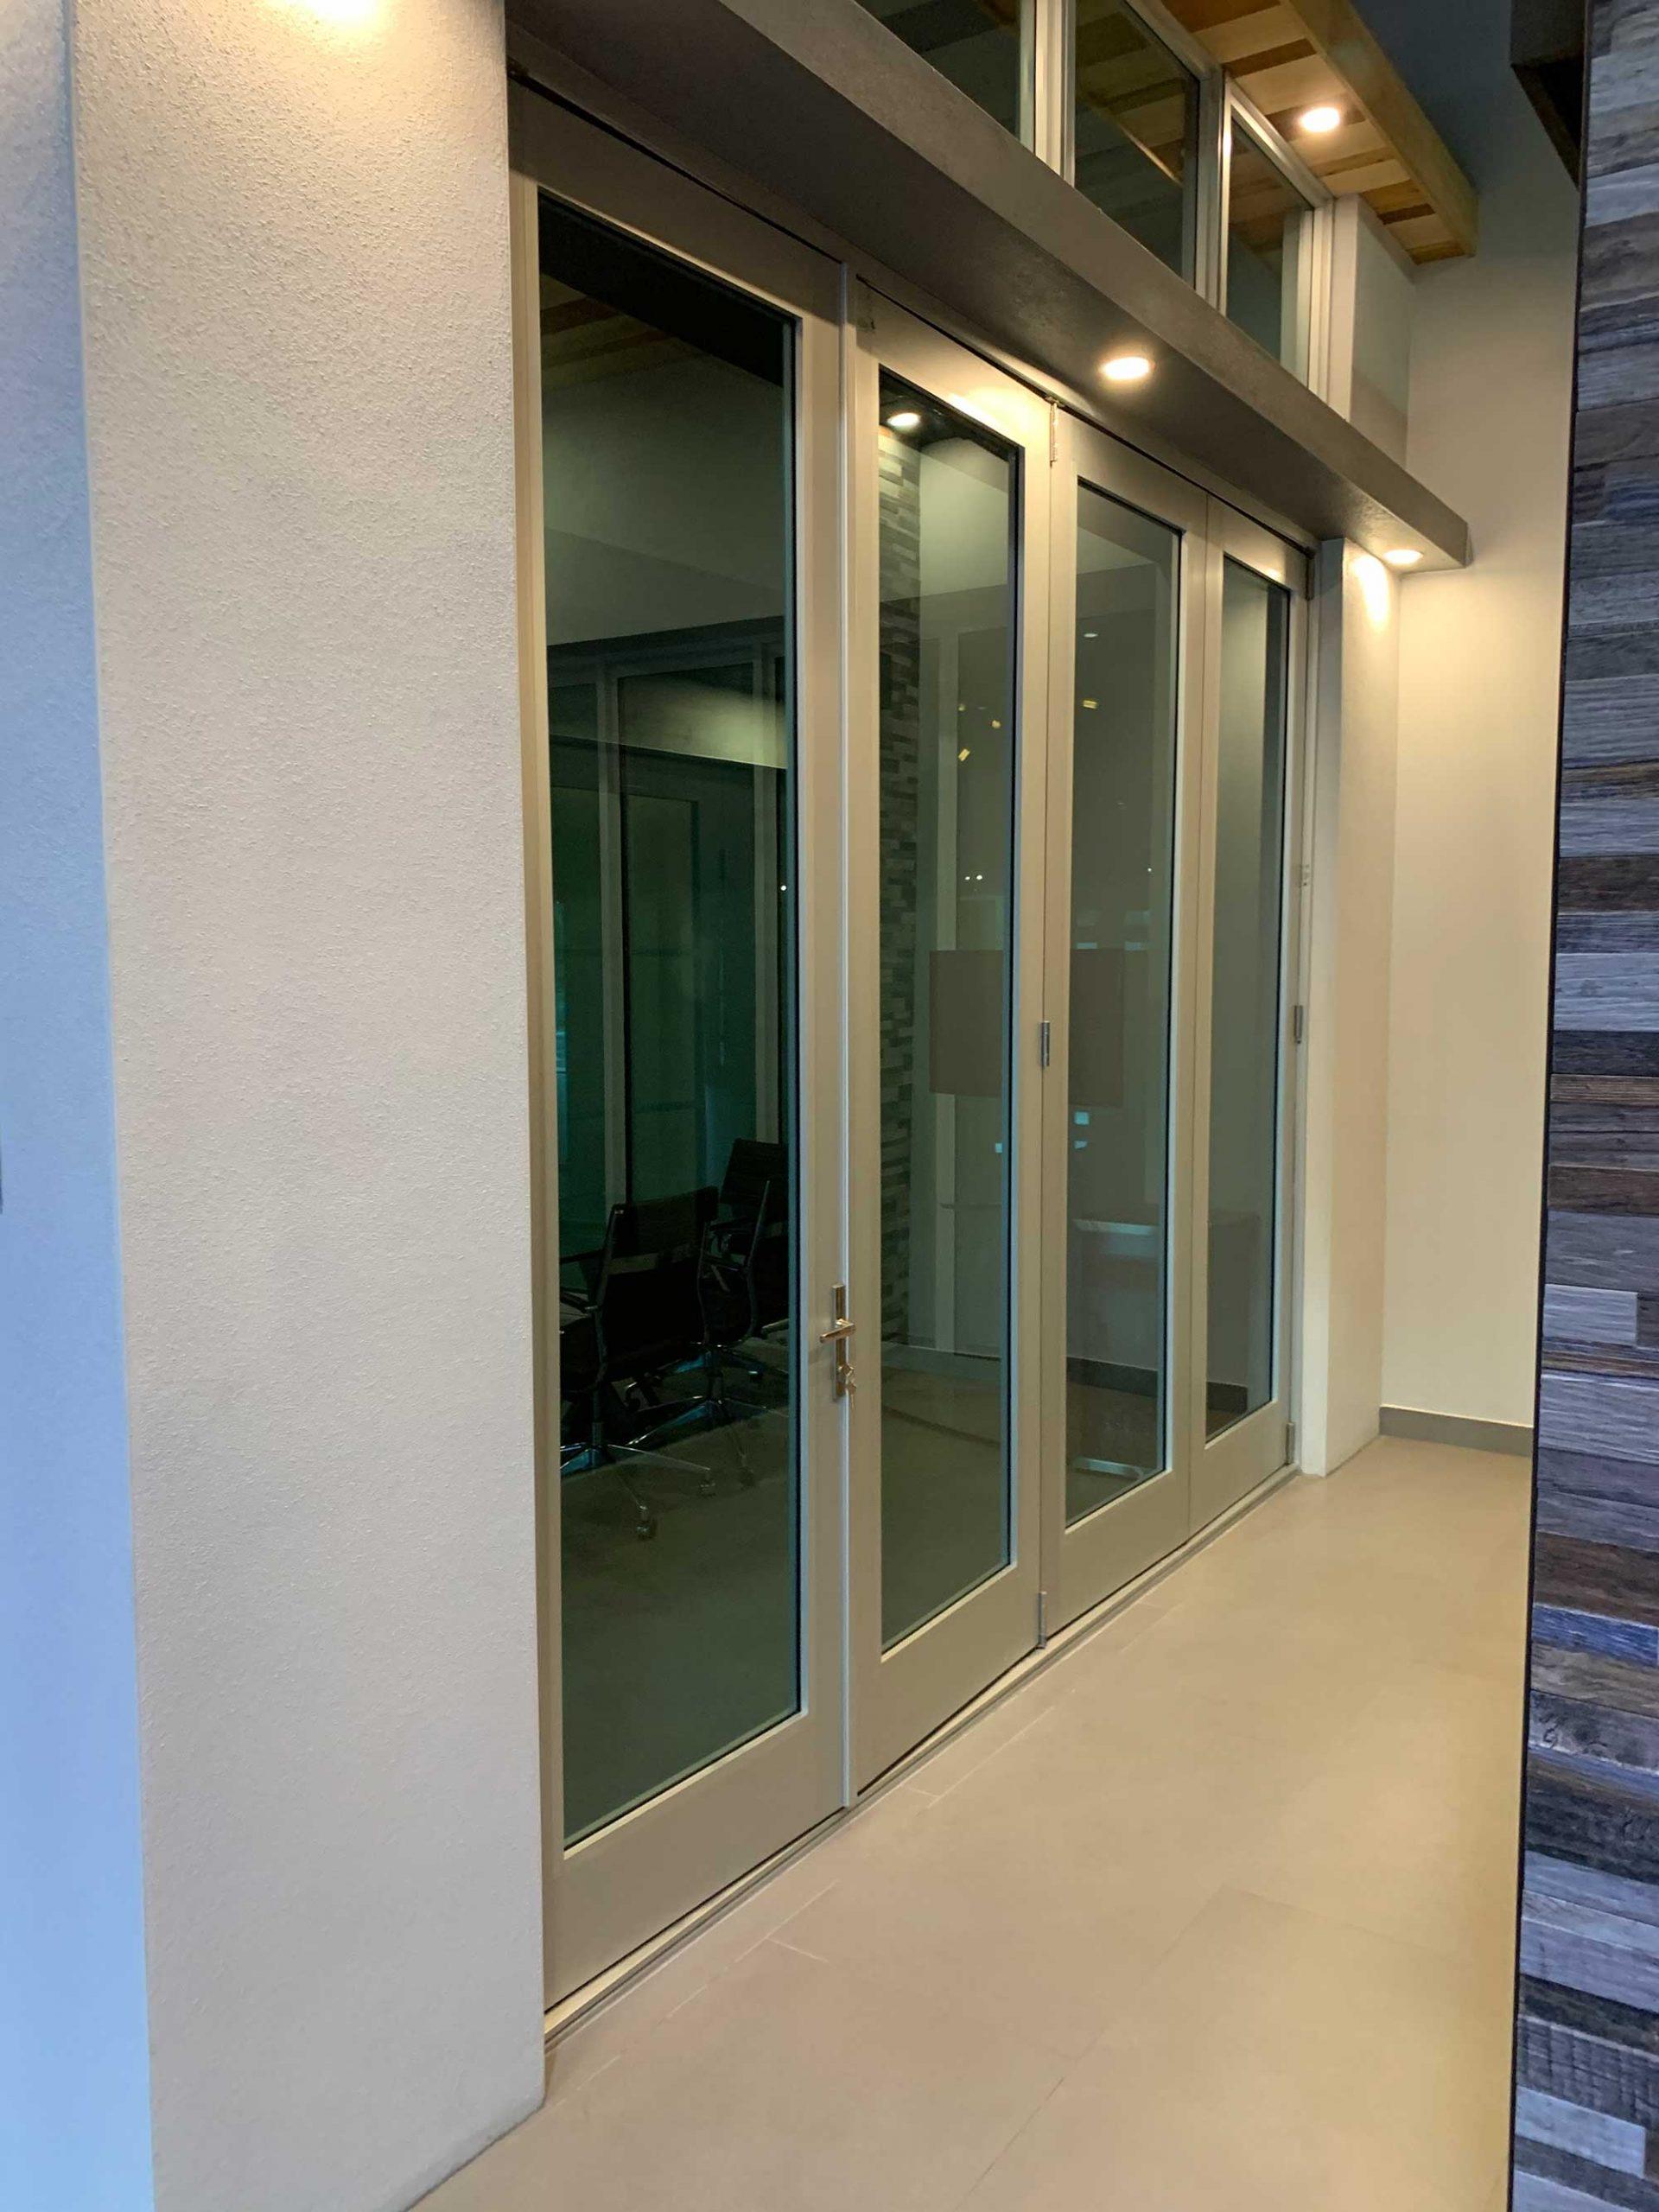 Bi-fold custom glass door and windows